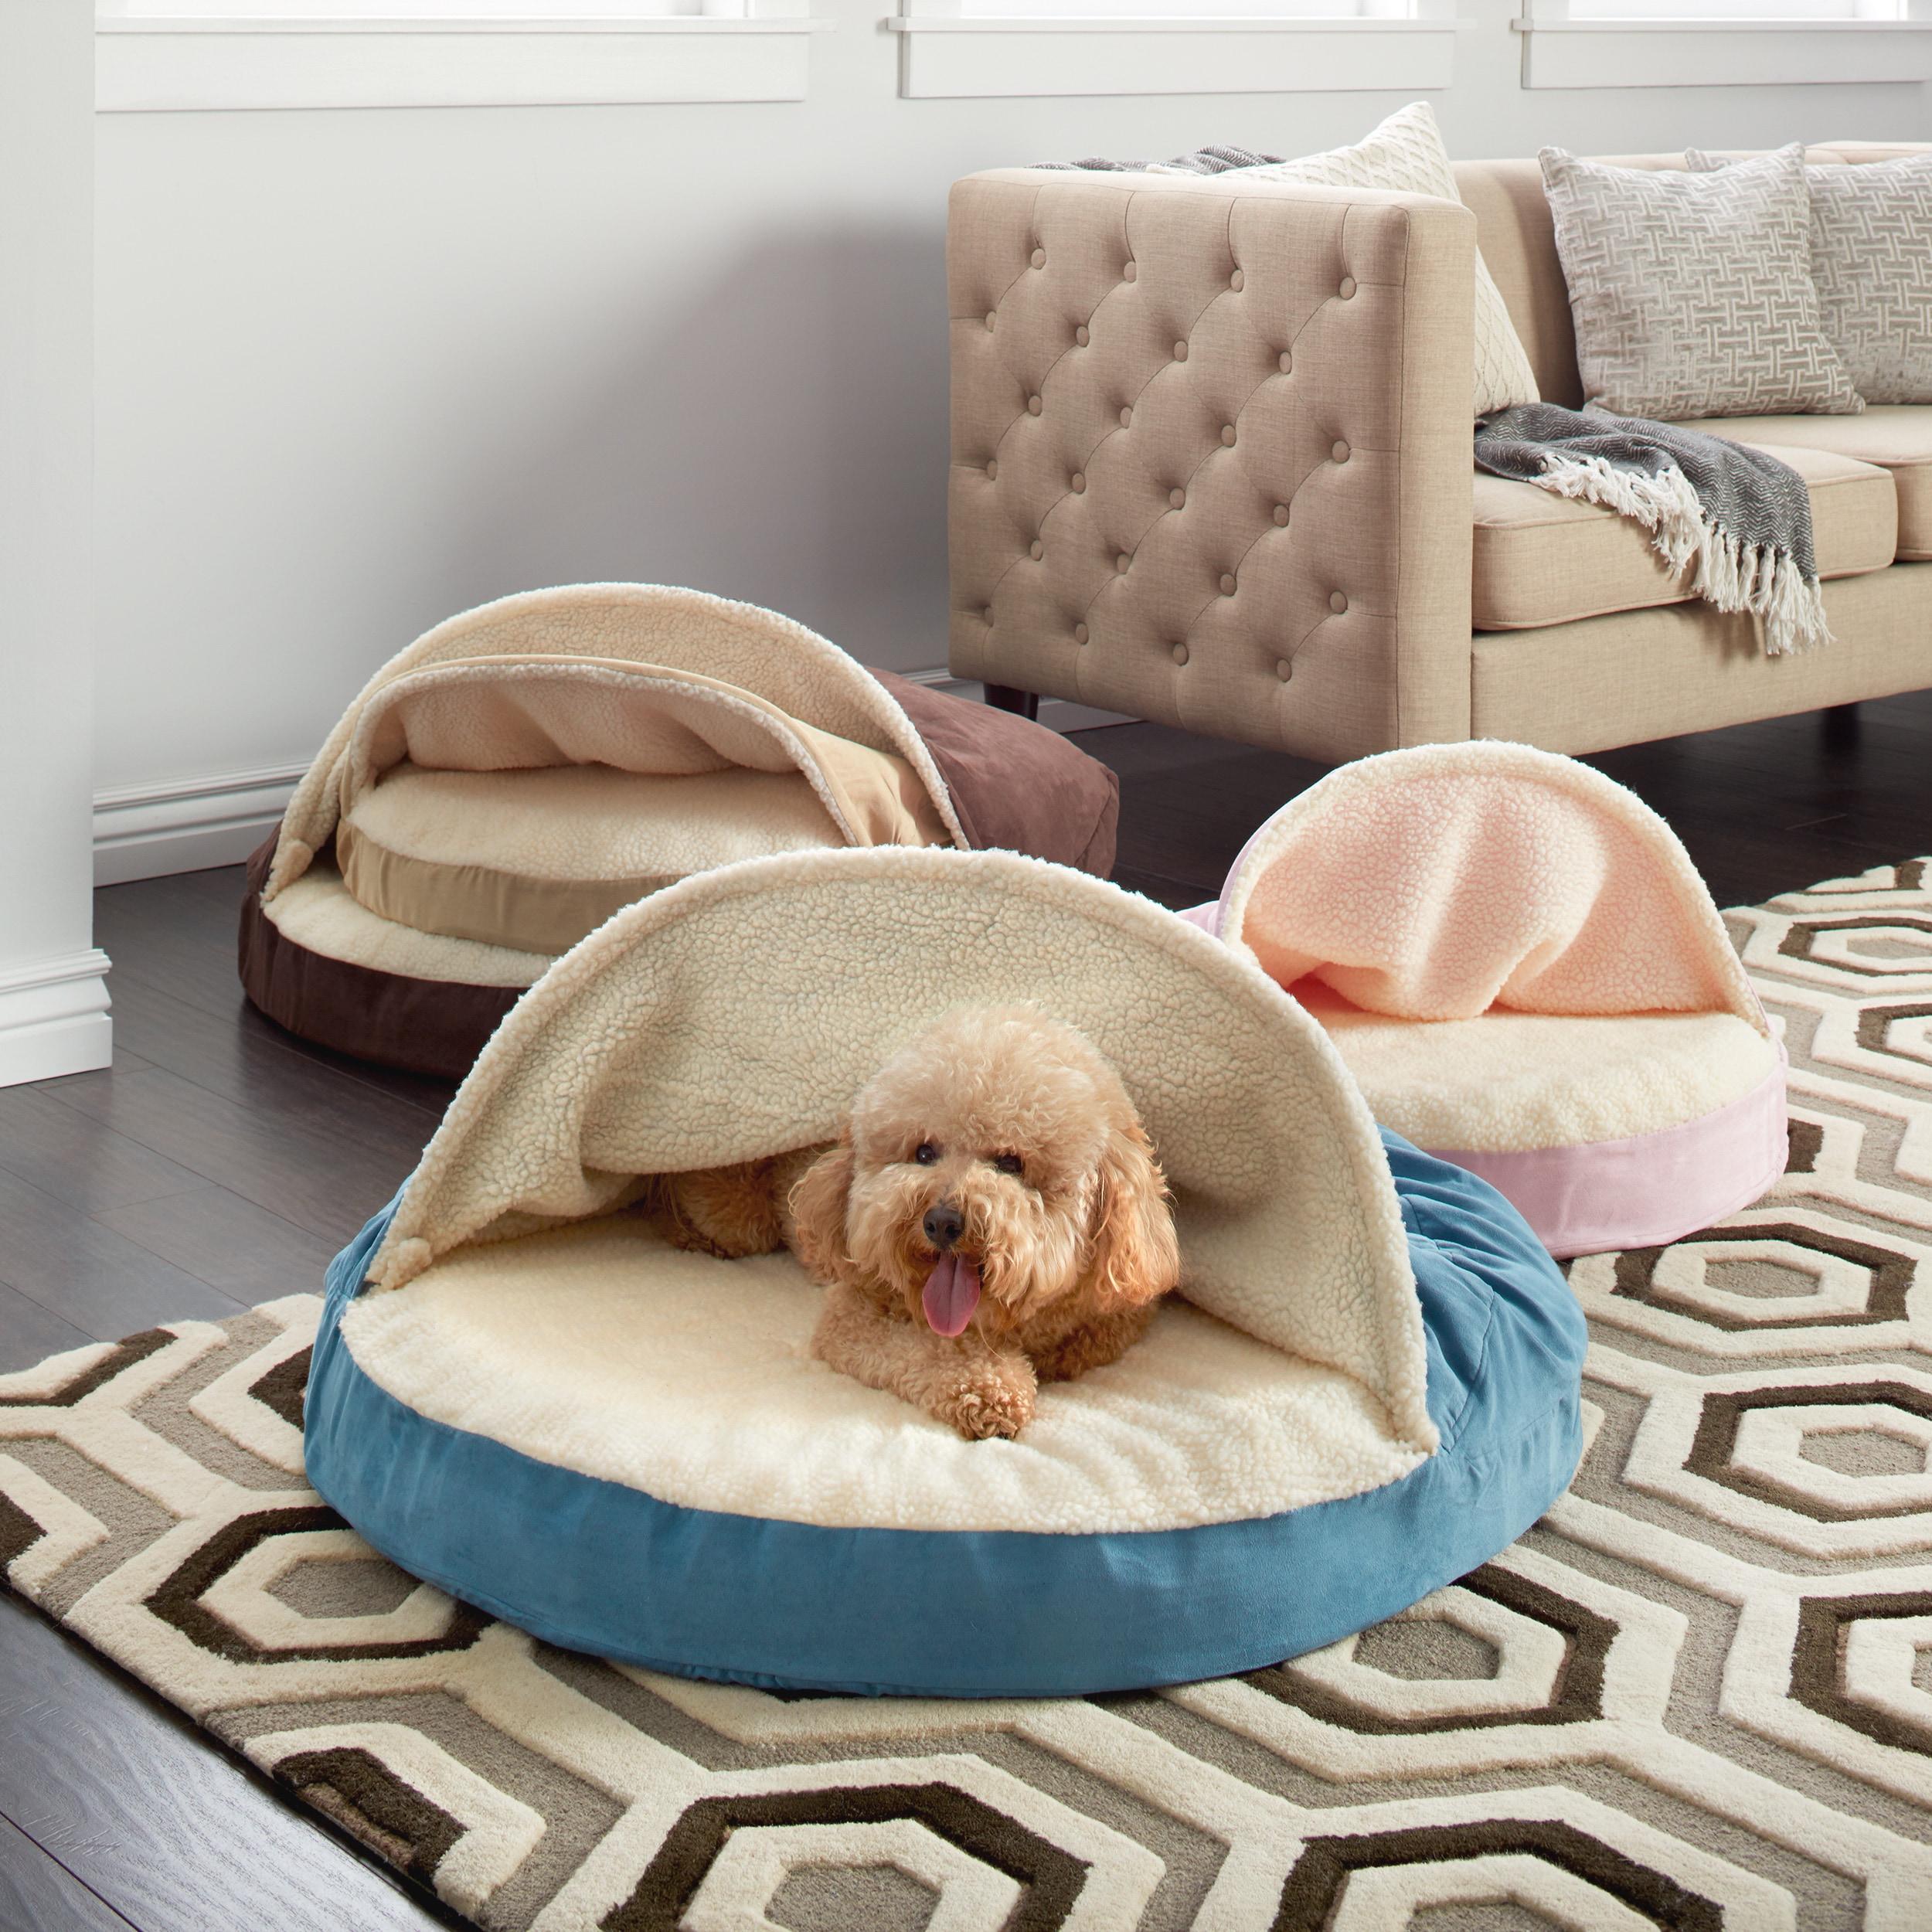 FurHaven Faux Sheepskin Snuggery Burrow Orthopedic Dog Be...